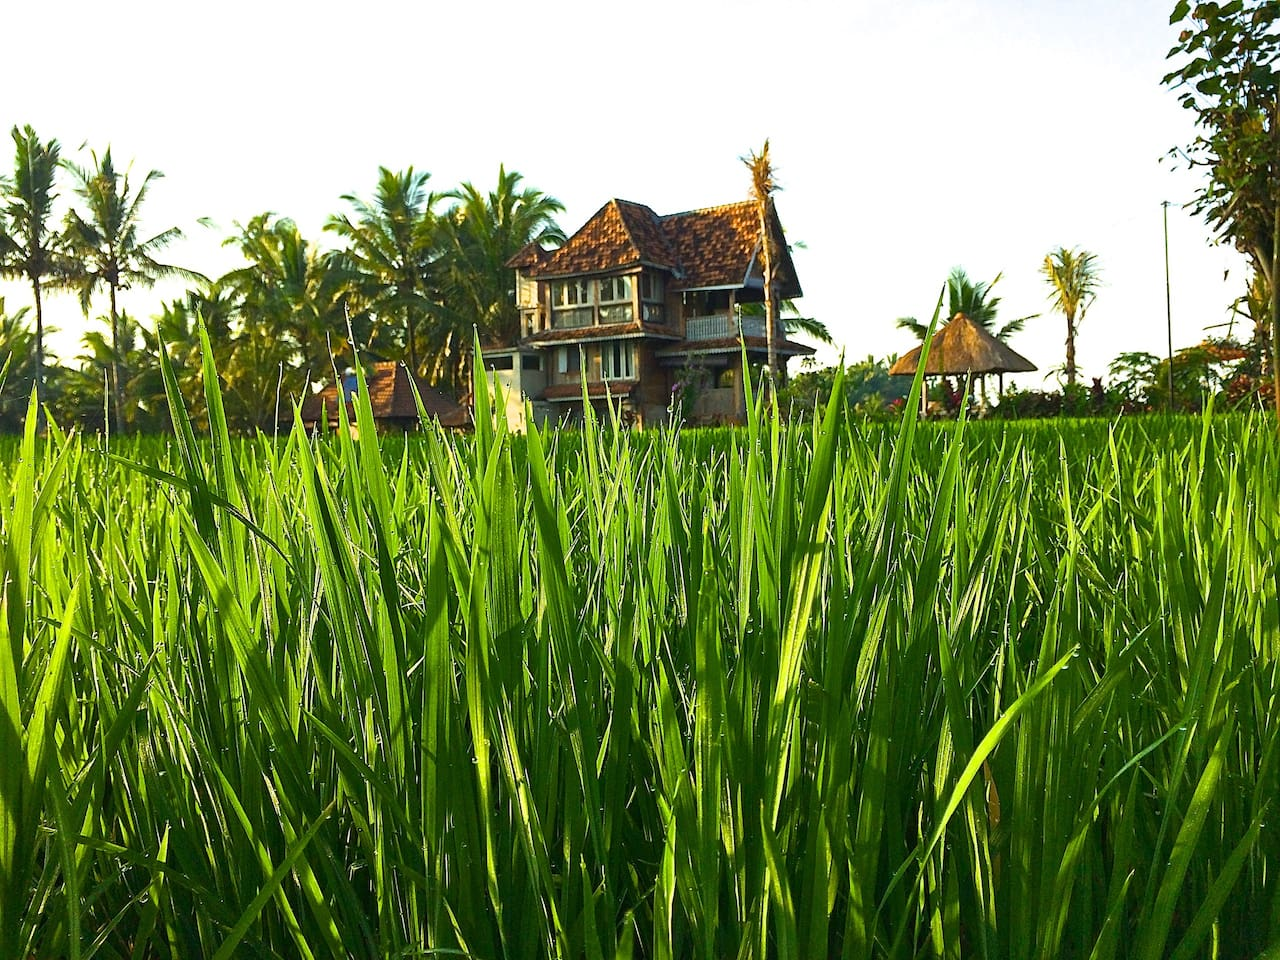 The Rice Joglo stands amongst the beautiful rice fields of Ubud